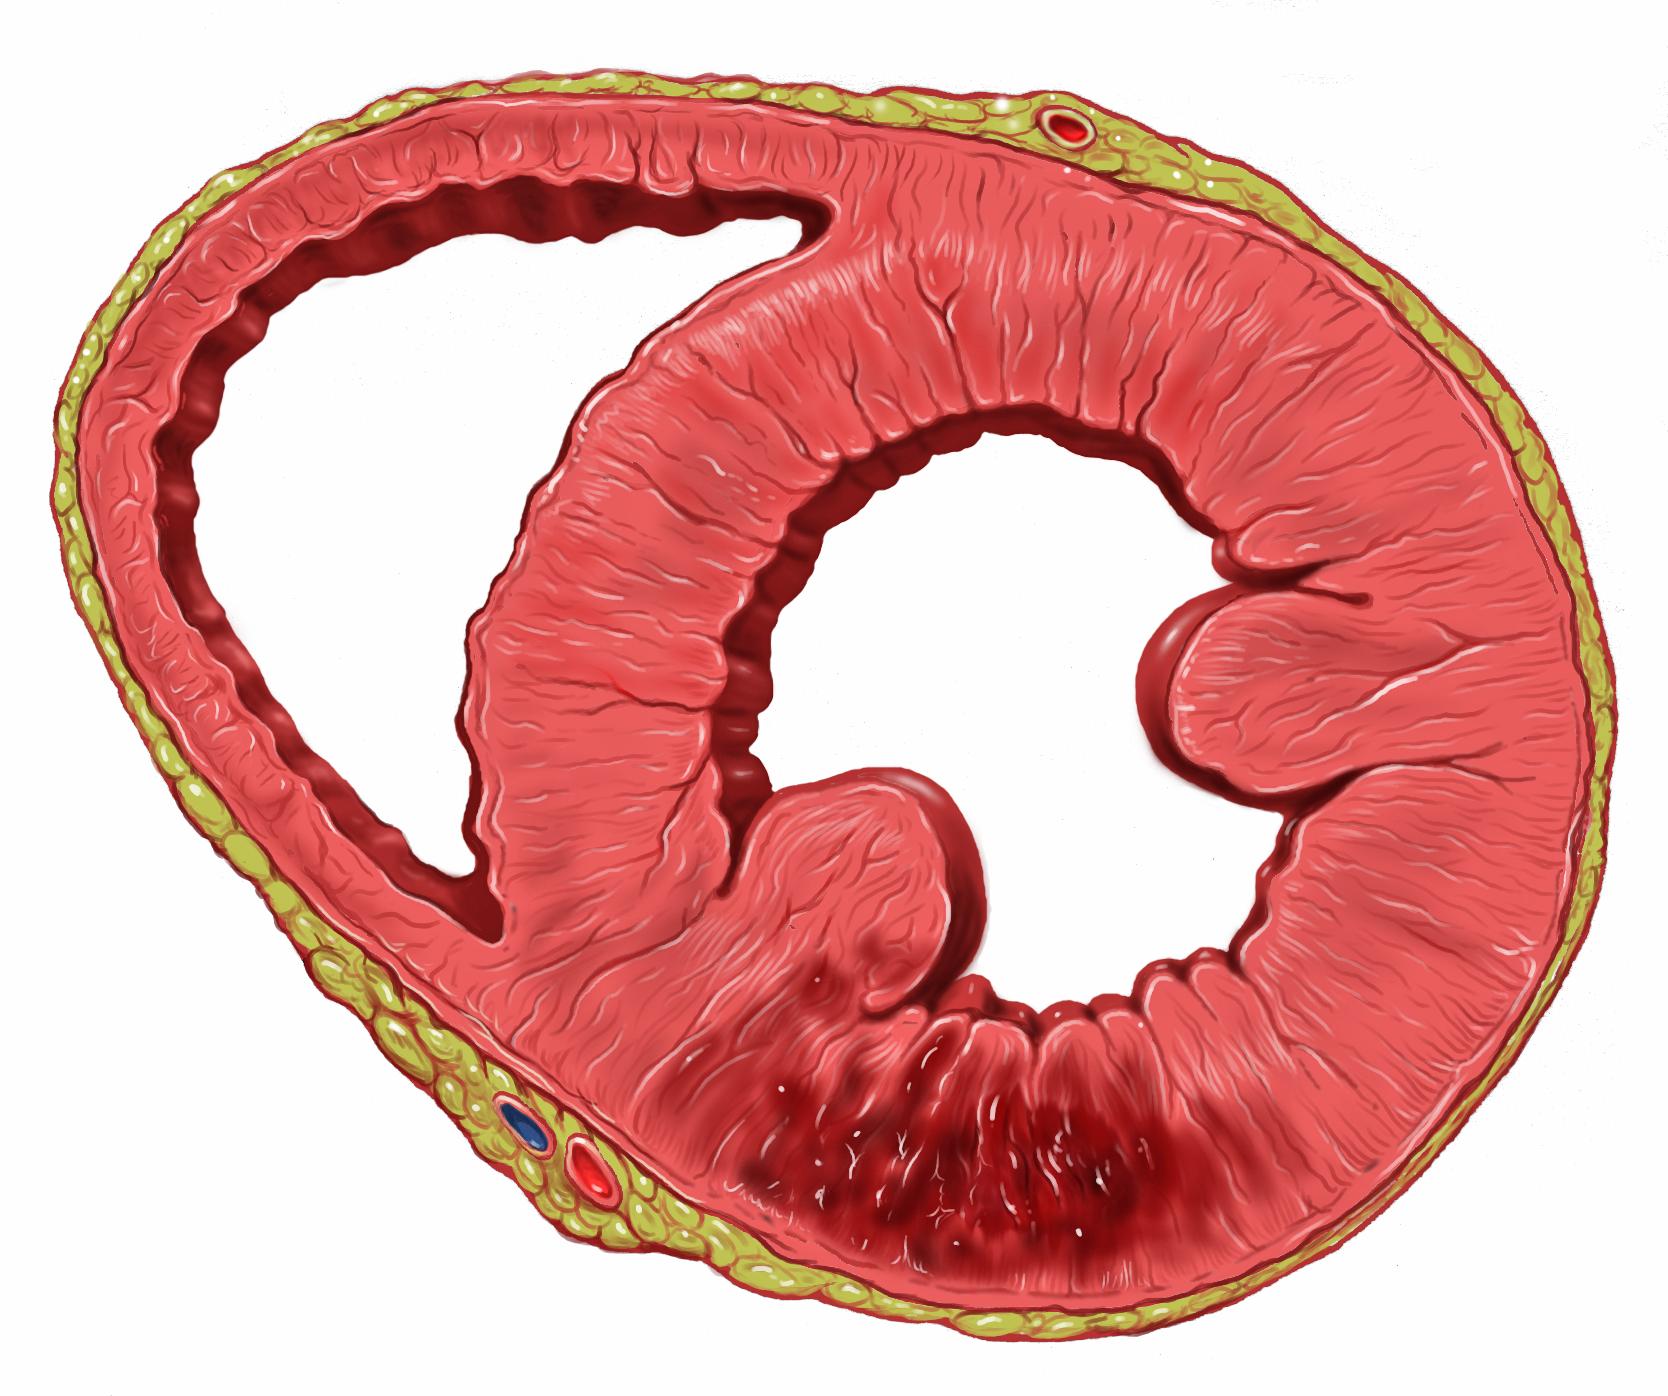 File:Heart inferior wall infarct.jpg - Wikimedia Commons